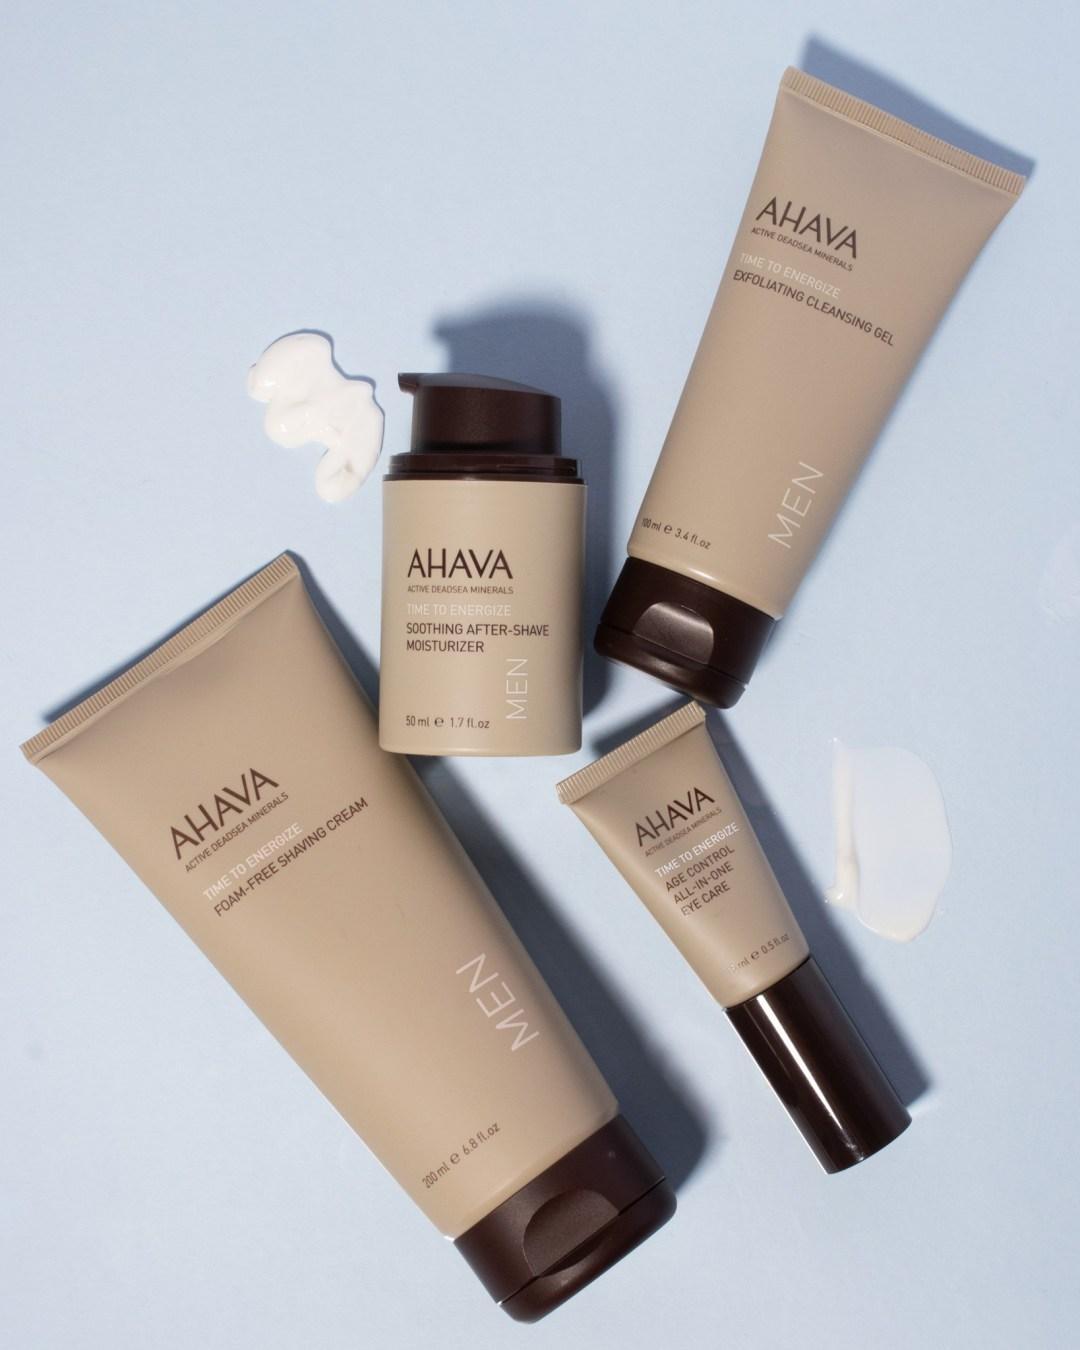 free-ahava-skincare-product-testing